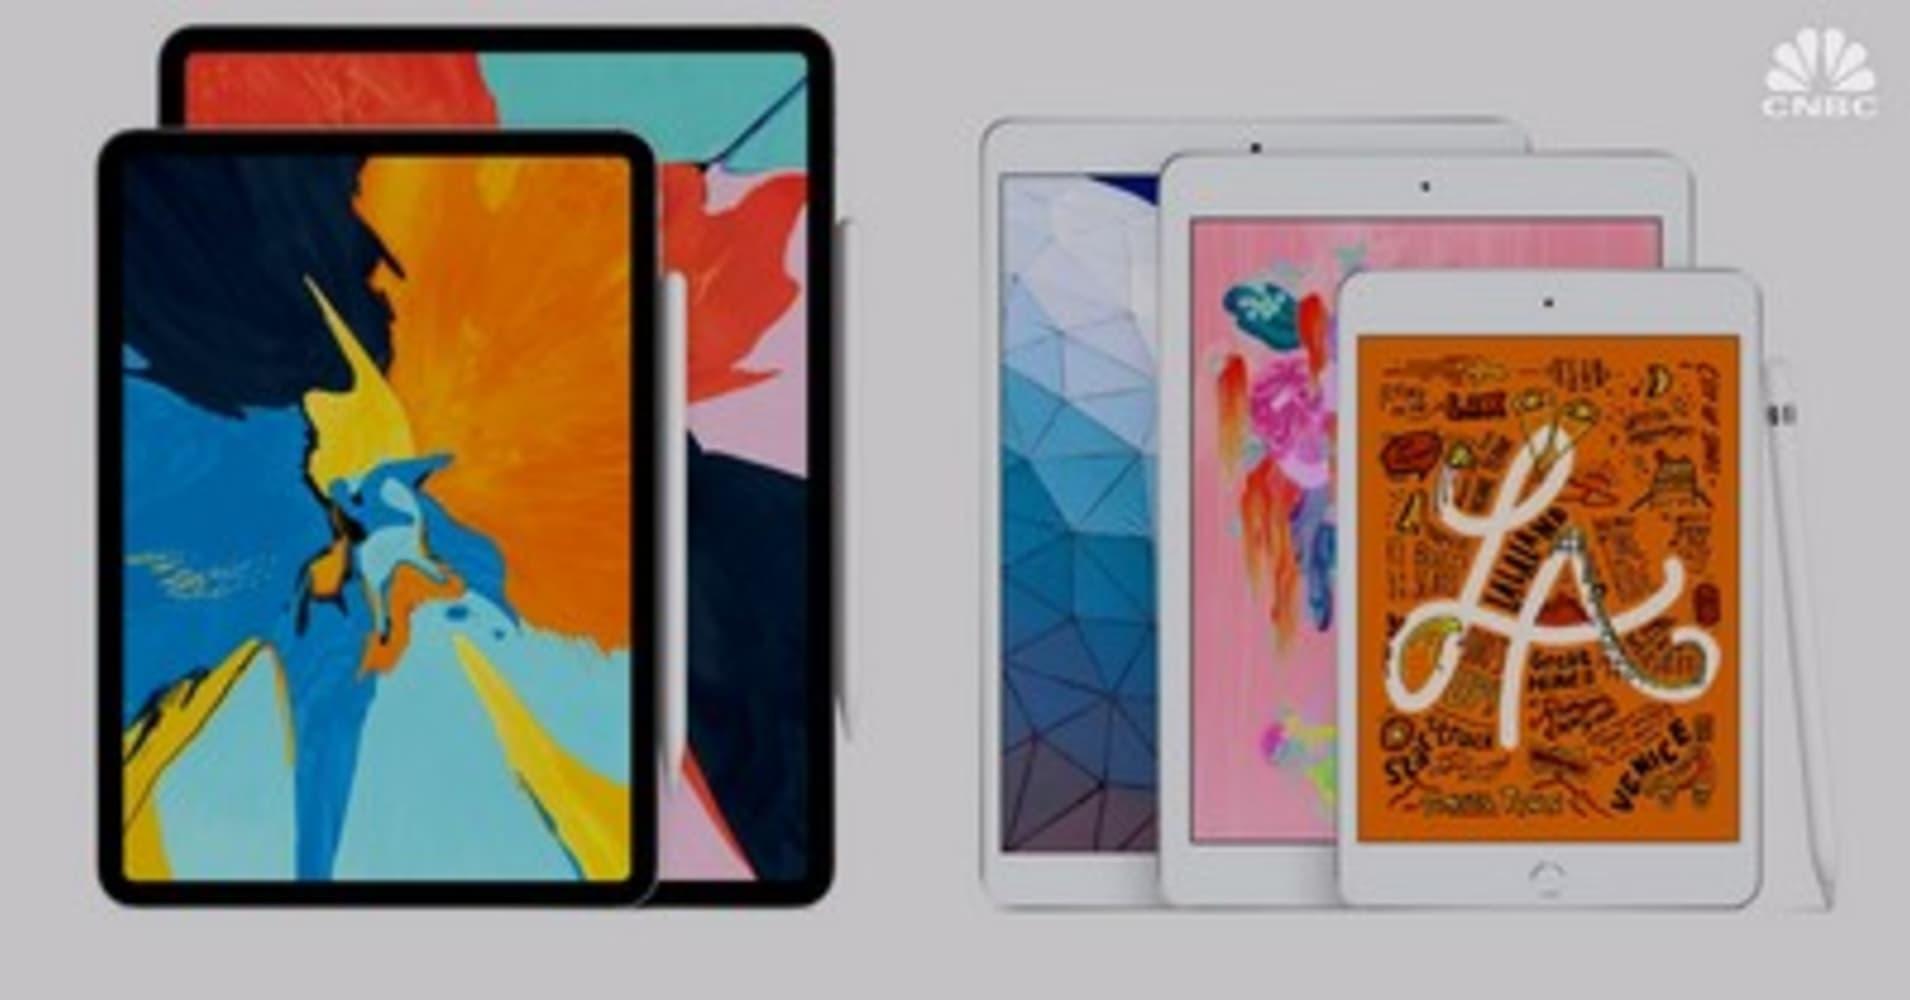 Apple releases new iPad Air and iPad Mini